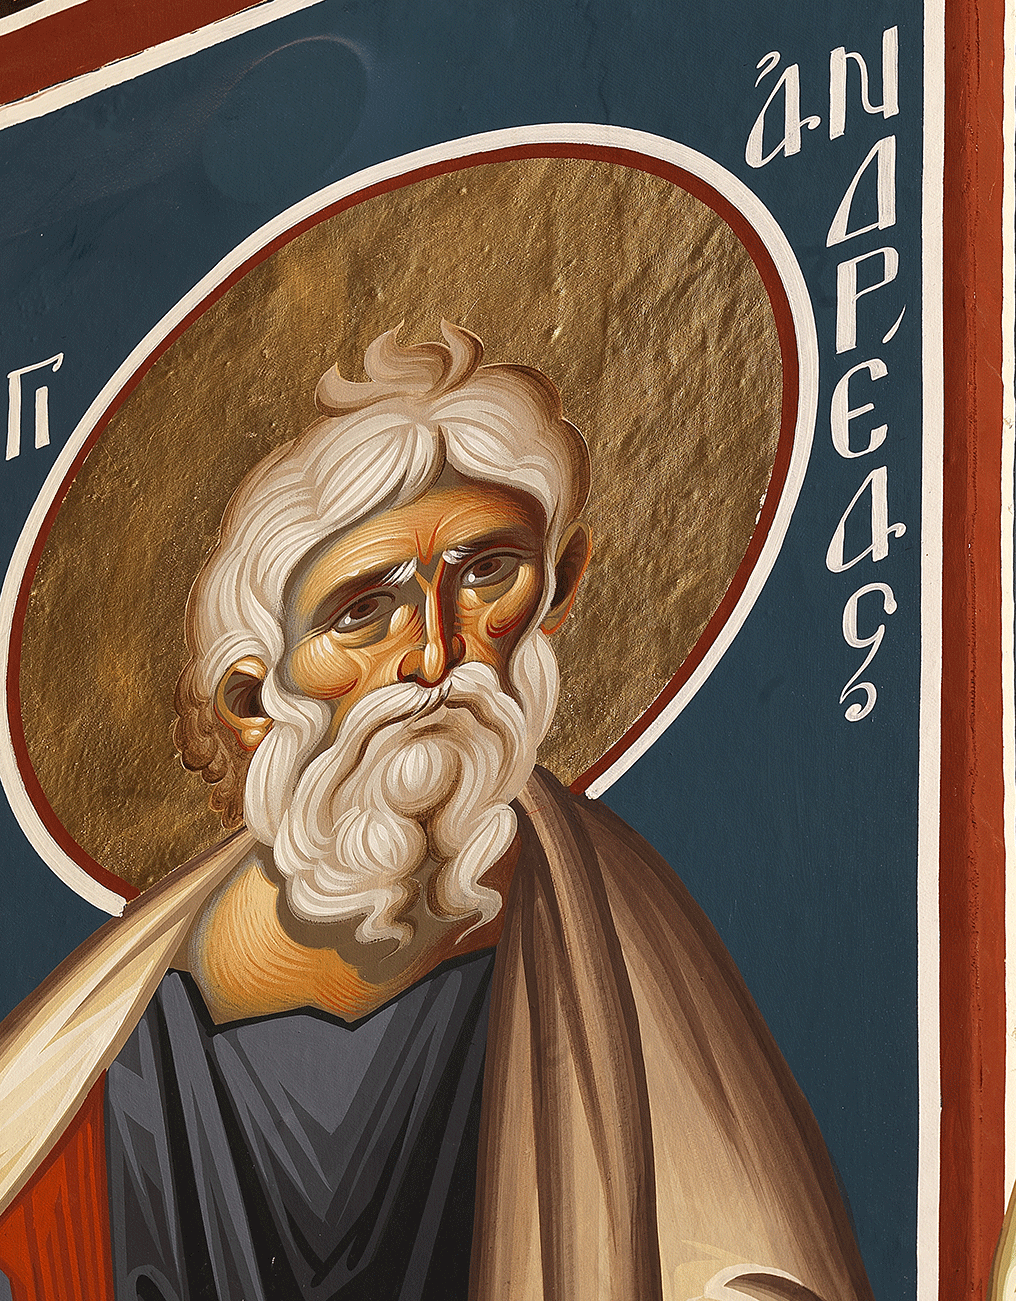 Ukrainian Orthodox Church of St. Anne: Святий Апостол Андрій Первозванний • Holy Apostle Andrew, the First-Called